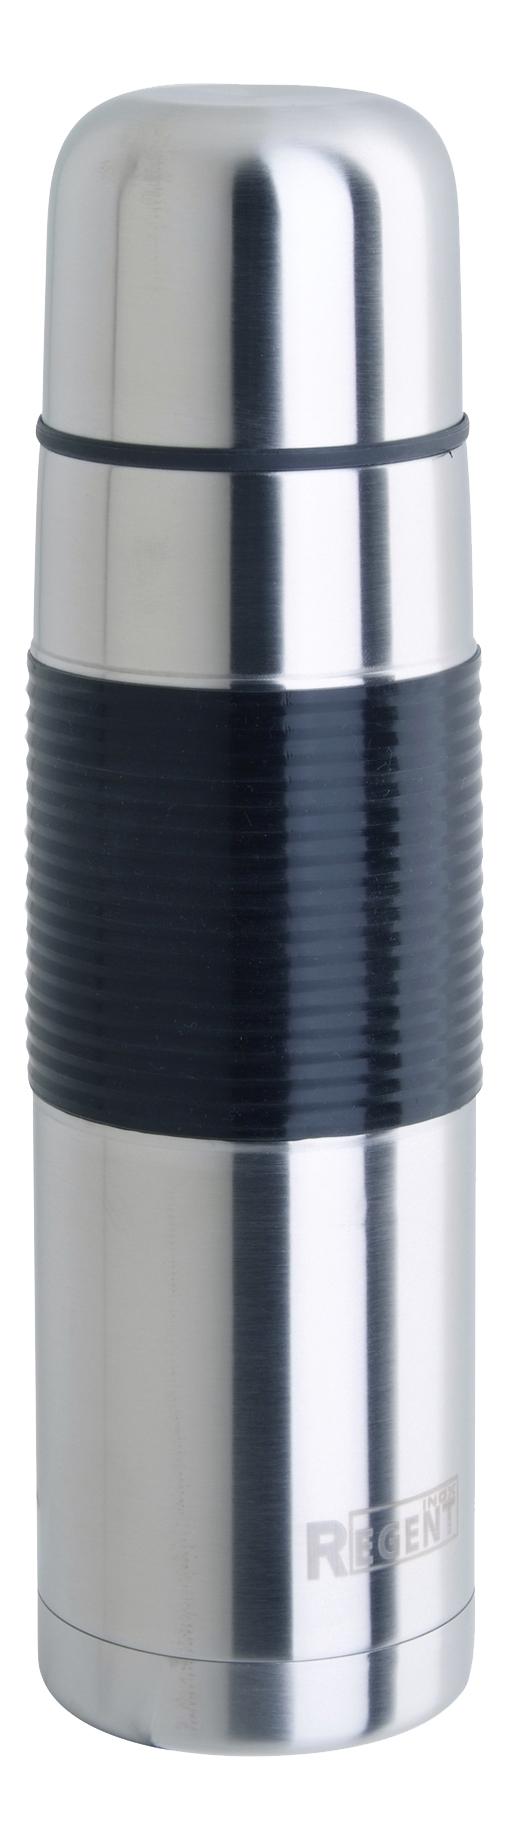 REGENT INOX BULLET 93-TE-B-2-500